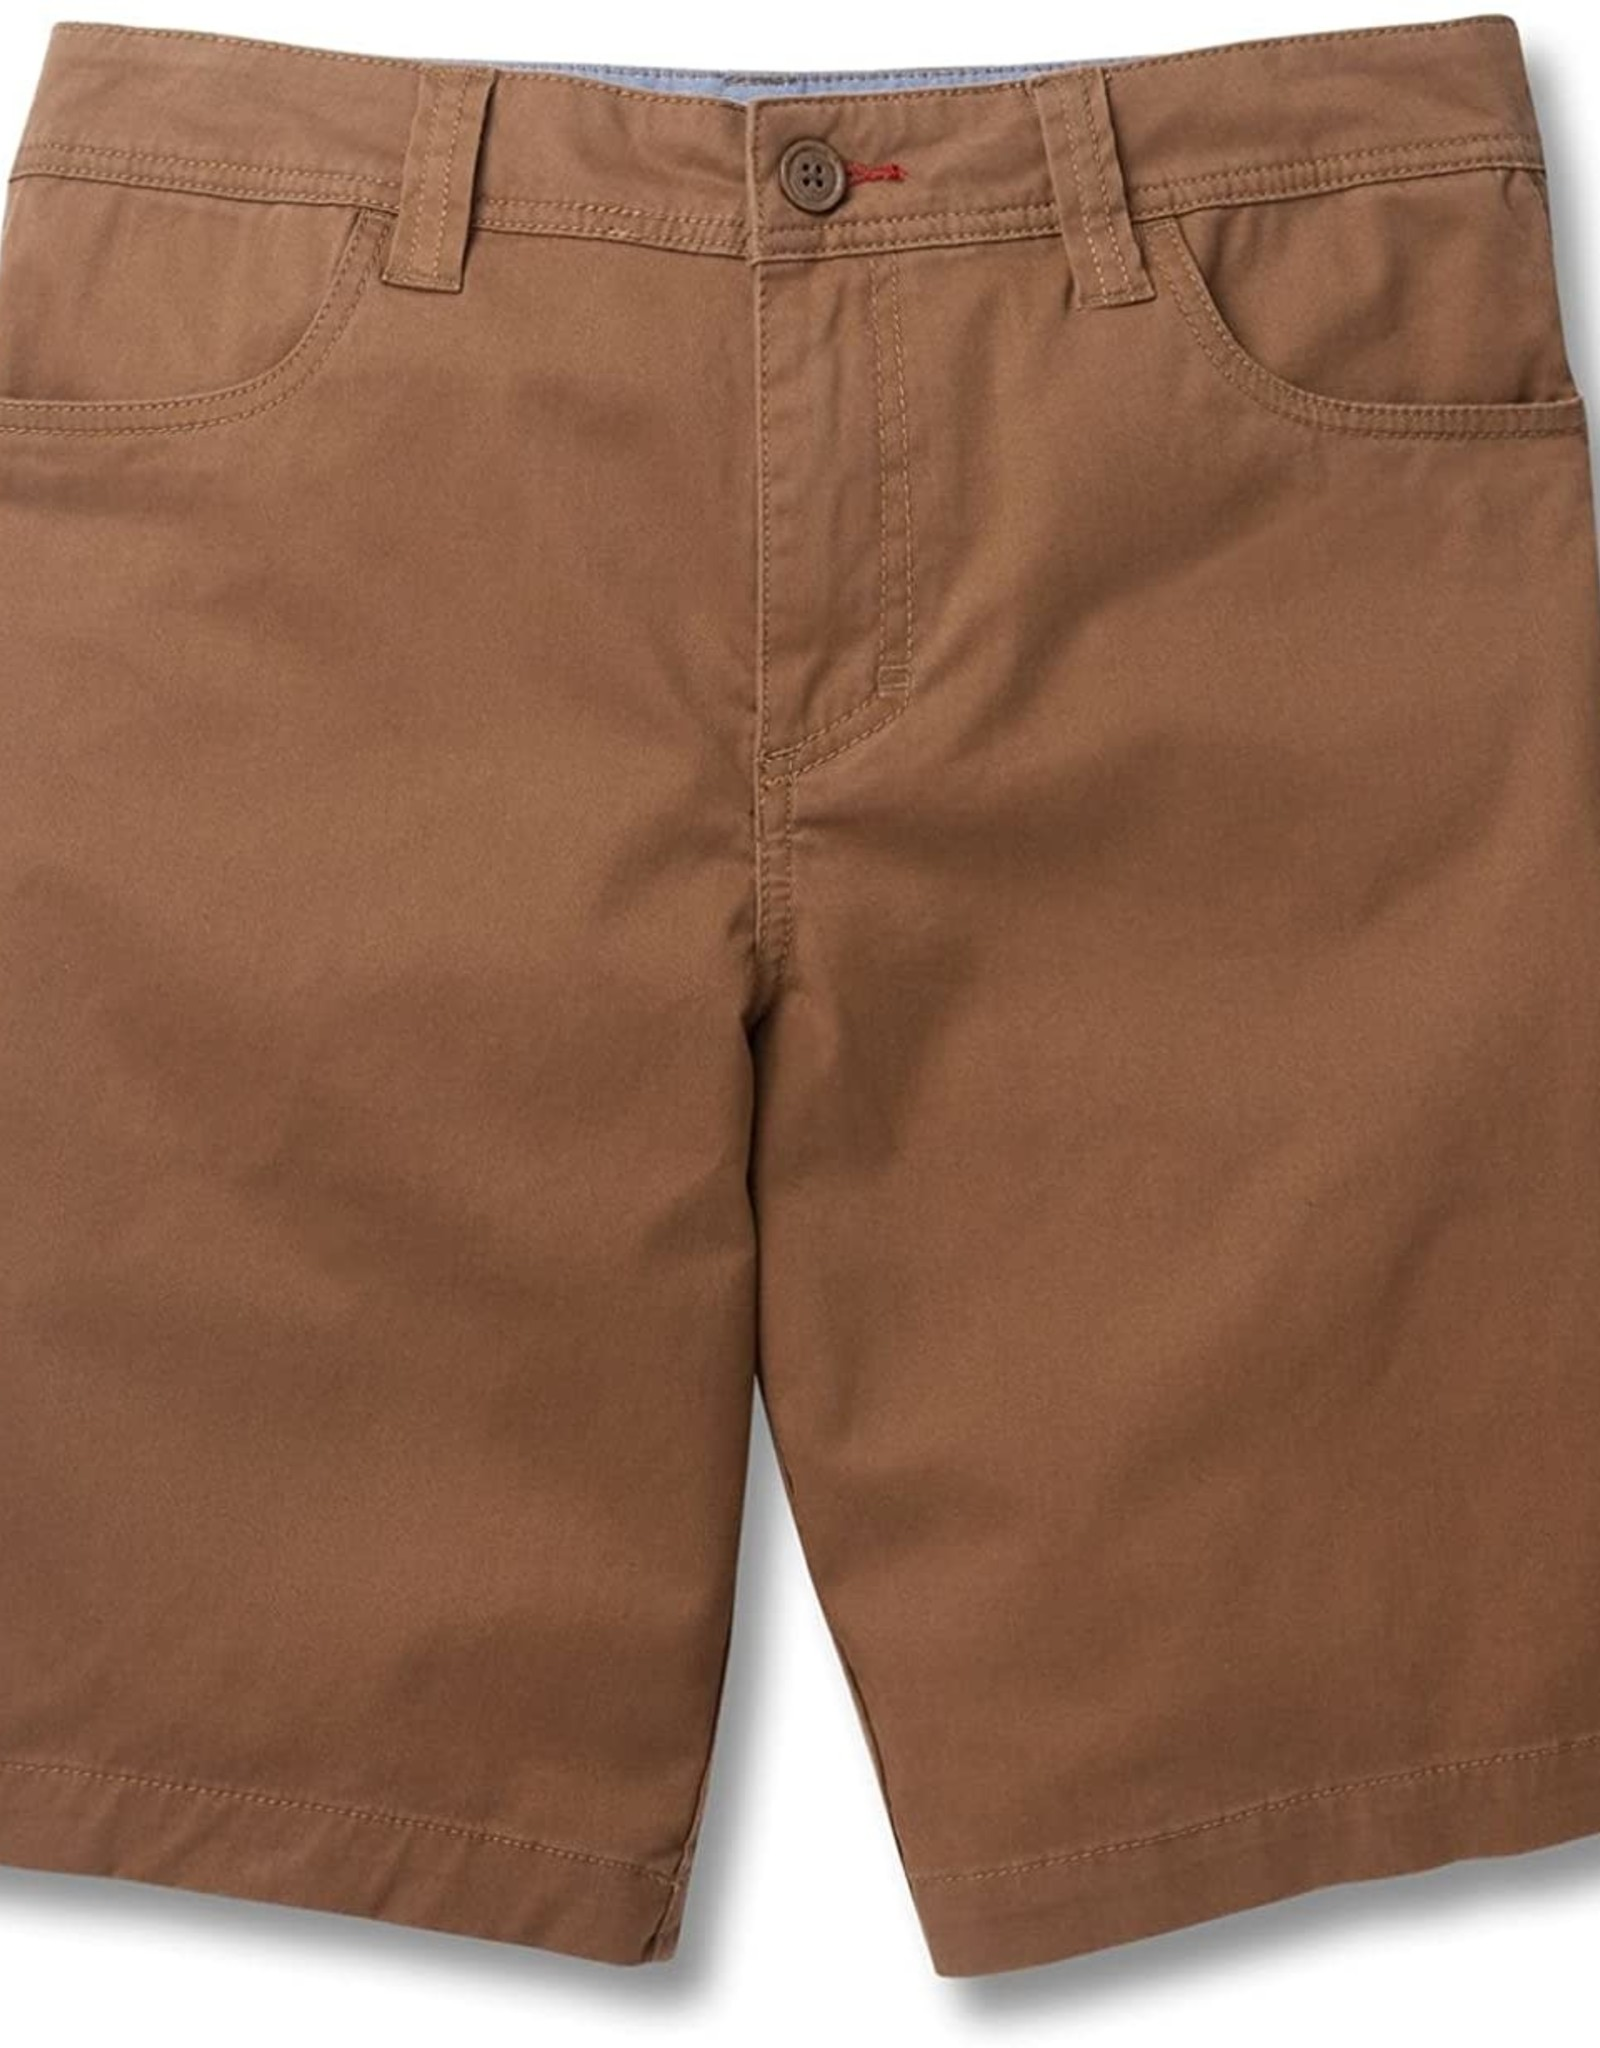 Toad&Co Mission ridge shorts